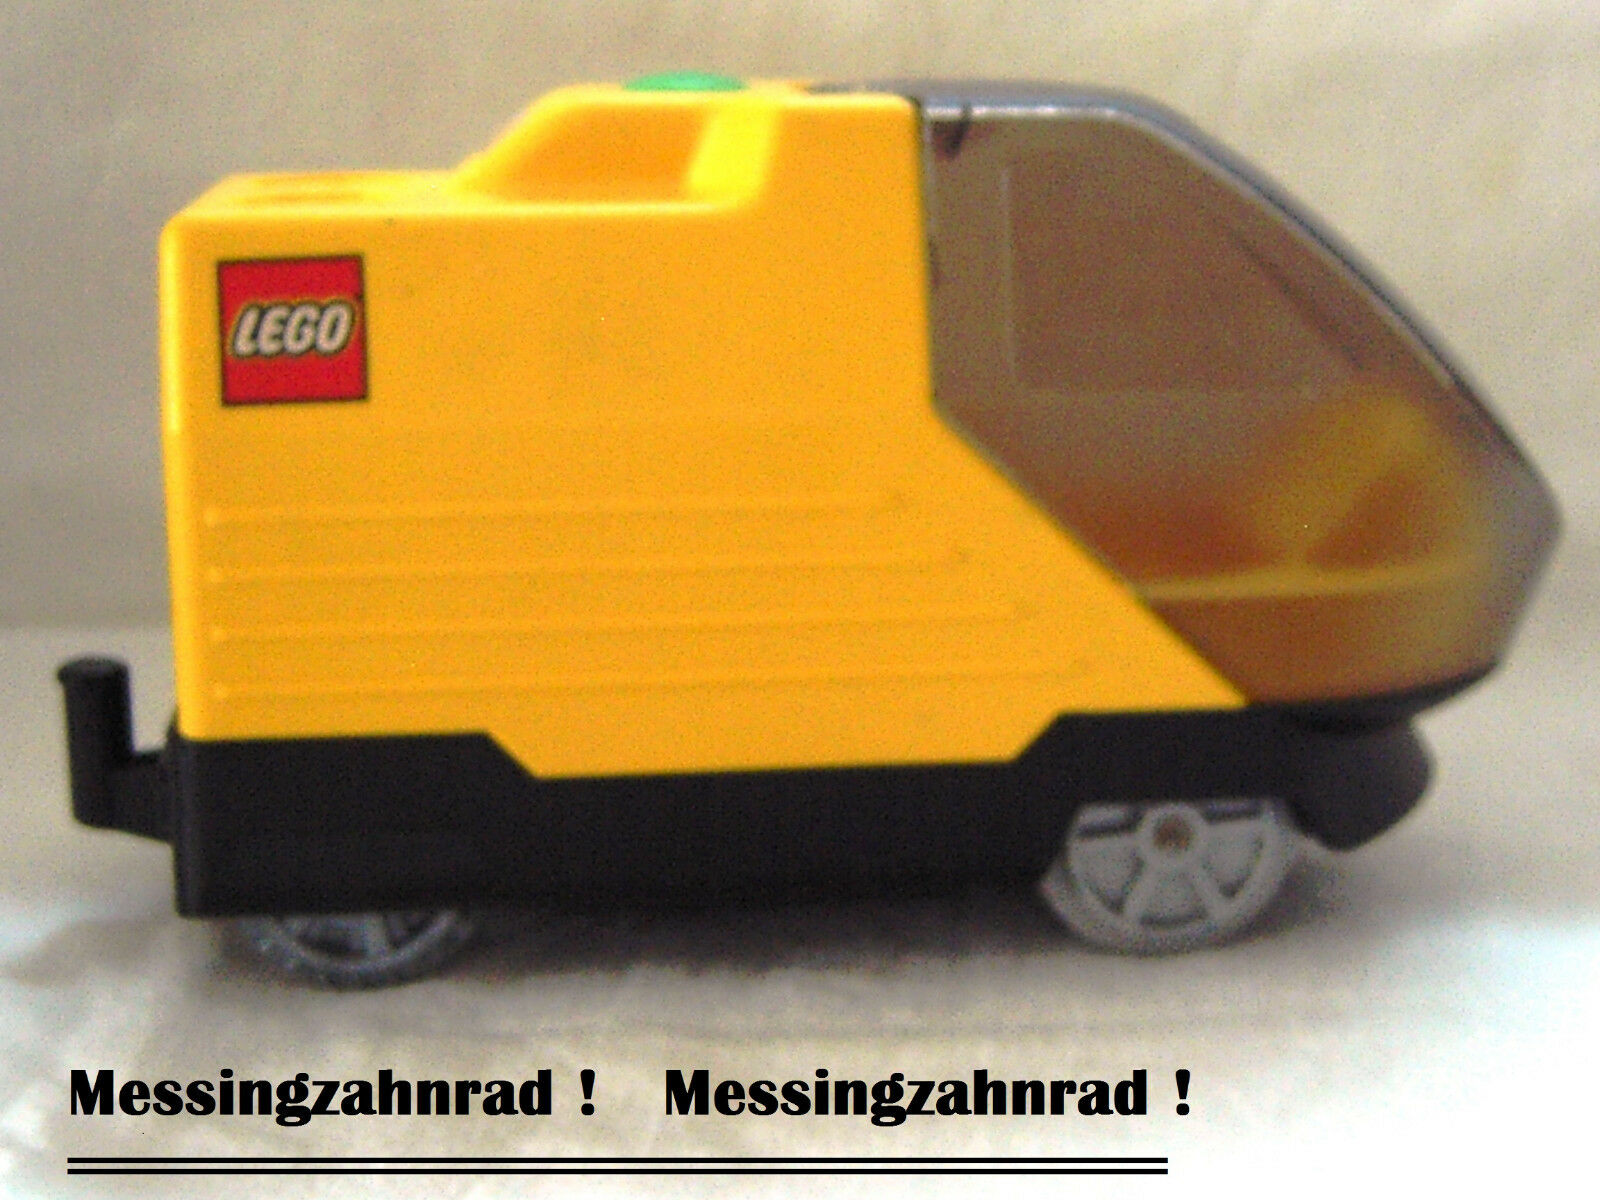 LEGO Duplo Eisenbahn elektrische Intelli Lok ZUG Batterie Betrieb Messingzahnrad Messingzahnrad Messingzahnrad c4fba3